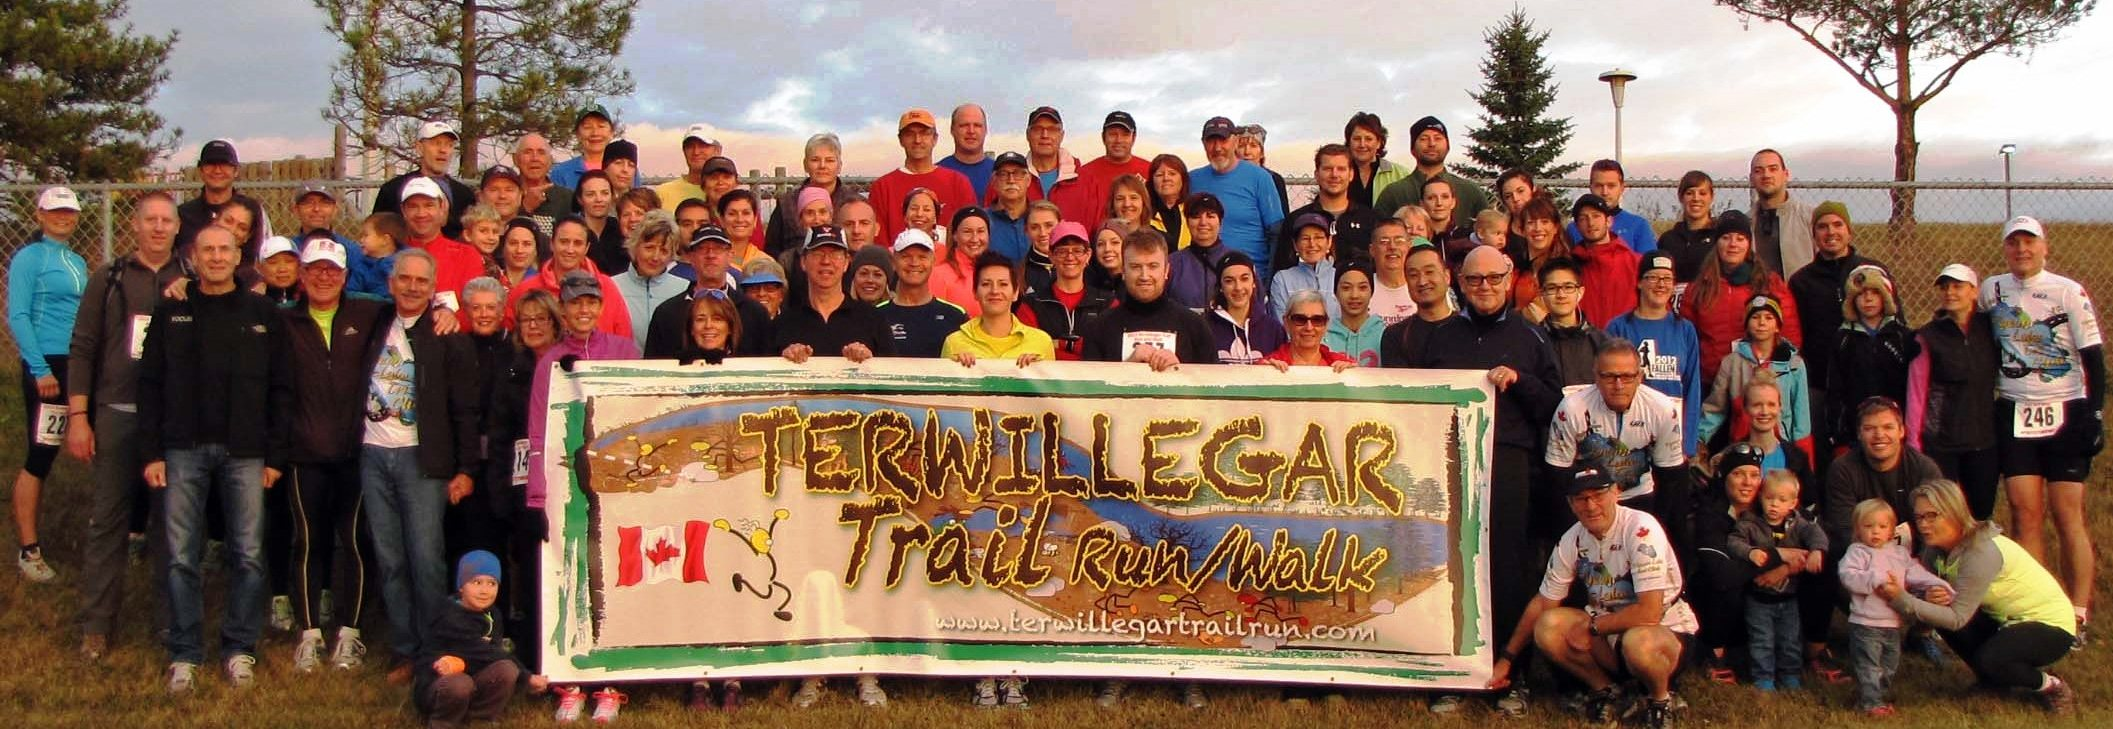 Terwillegar Trail Run/Walk 2019 @ Terwillegar Park